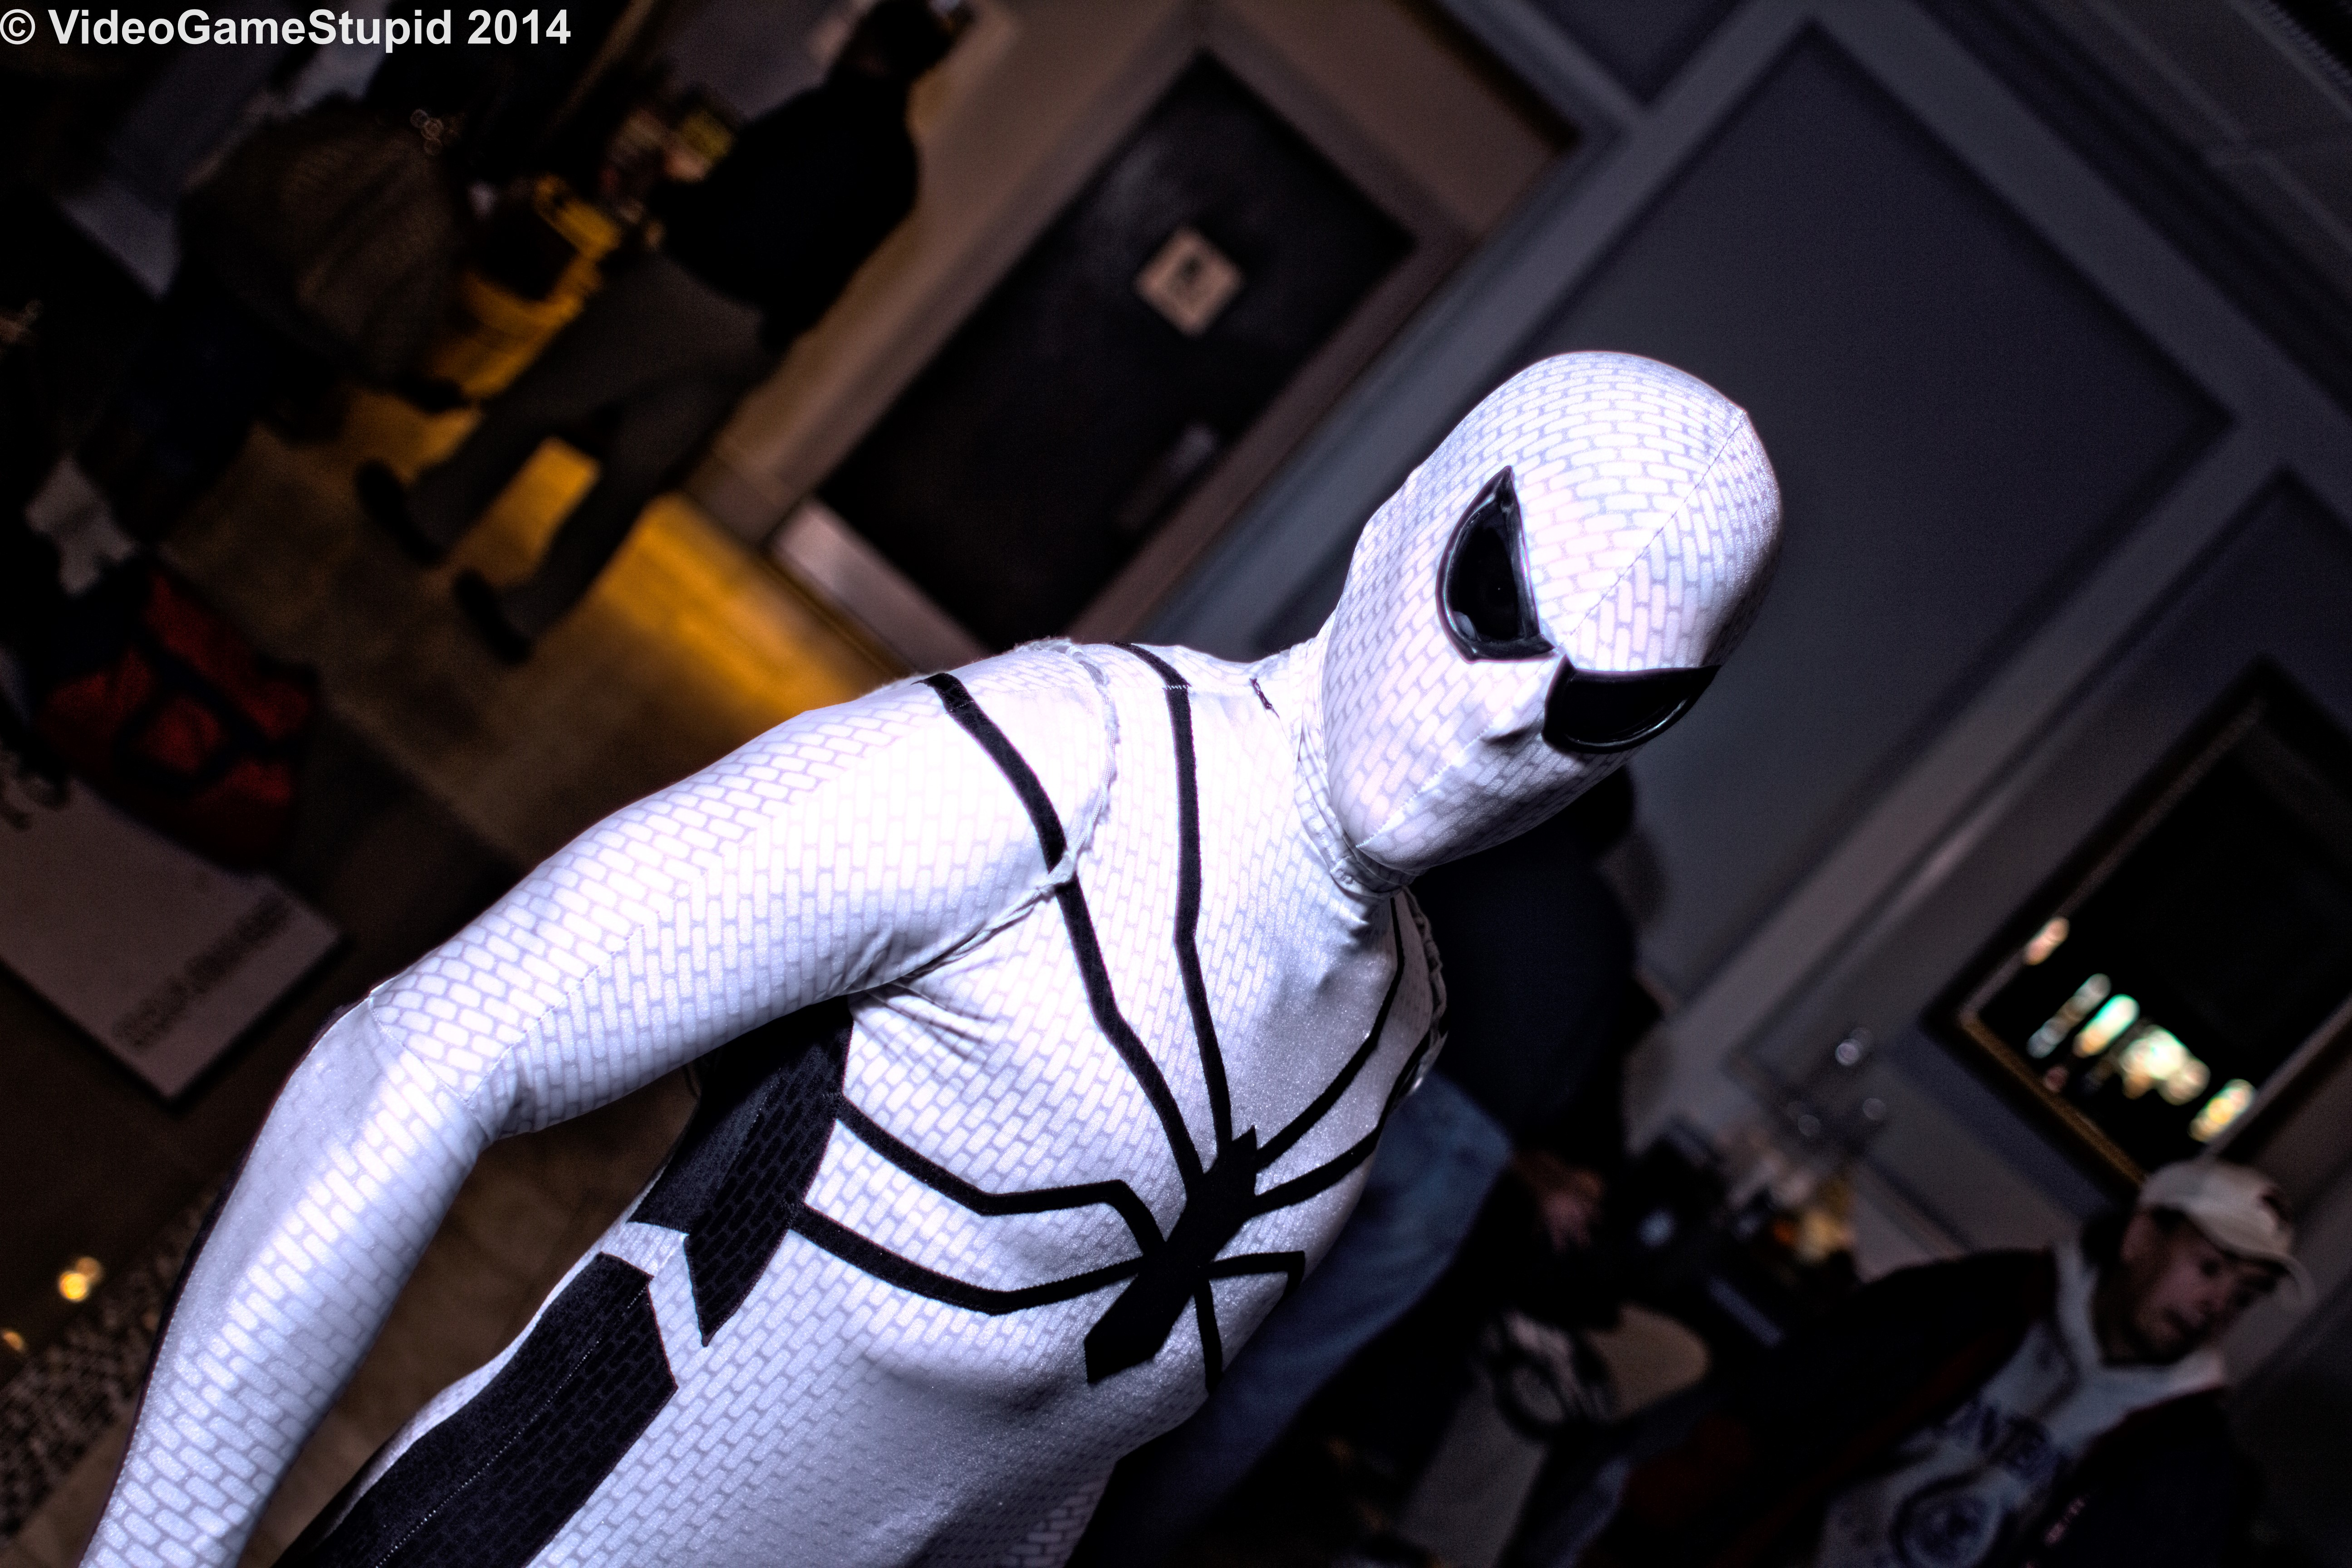 ... Super Mega Fest 2014 - Future Foundation Spiderman by VideoGameStupid & Super Mega Fest 2014 - Future Foundation Spiderman by ...